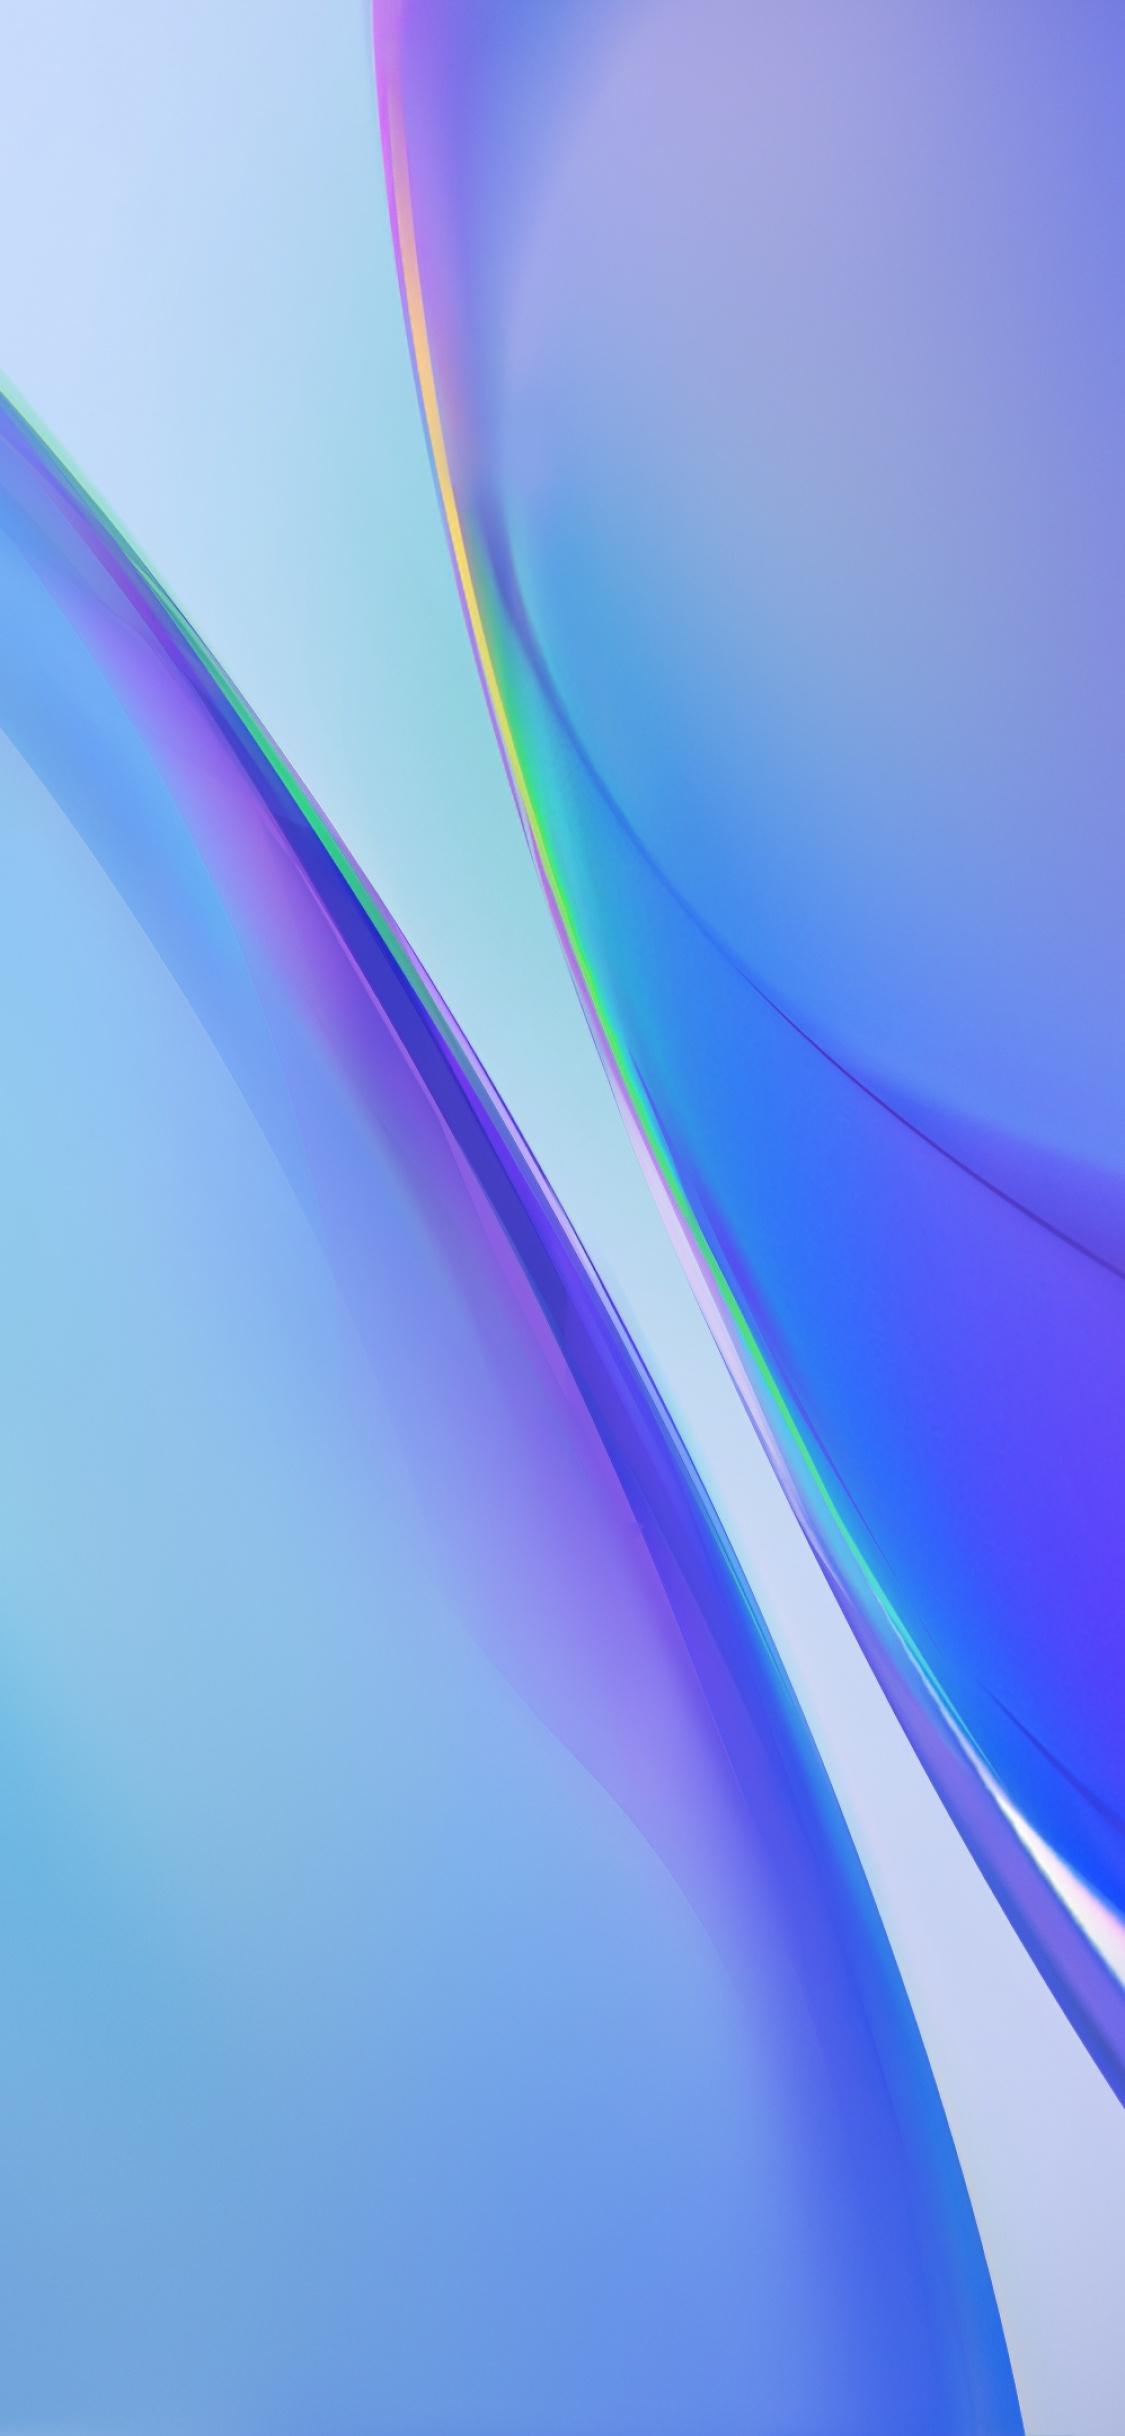 4K Wallpaper Android 10, Stock, Vivo NEX, Gradients, Blue ...